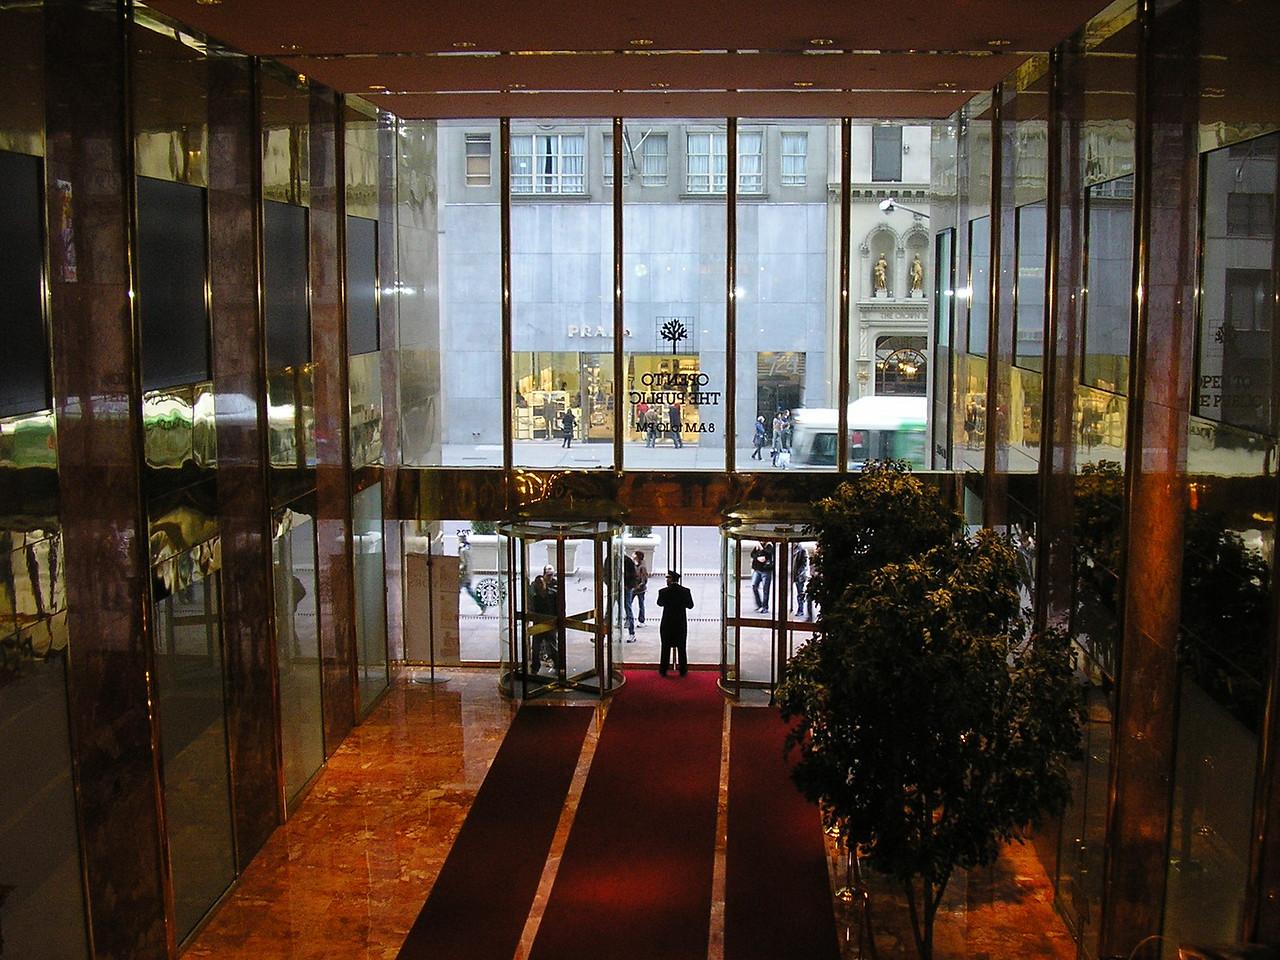 Trump Tower Lobby